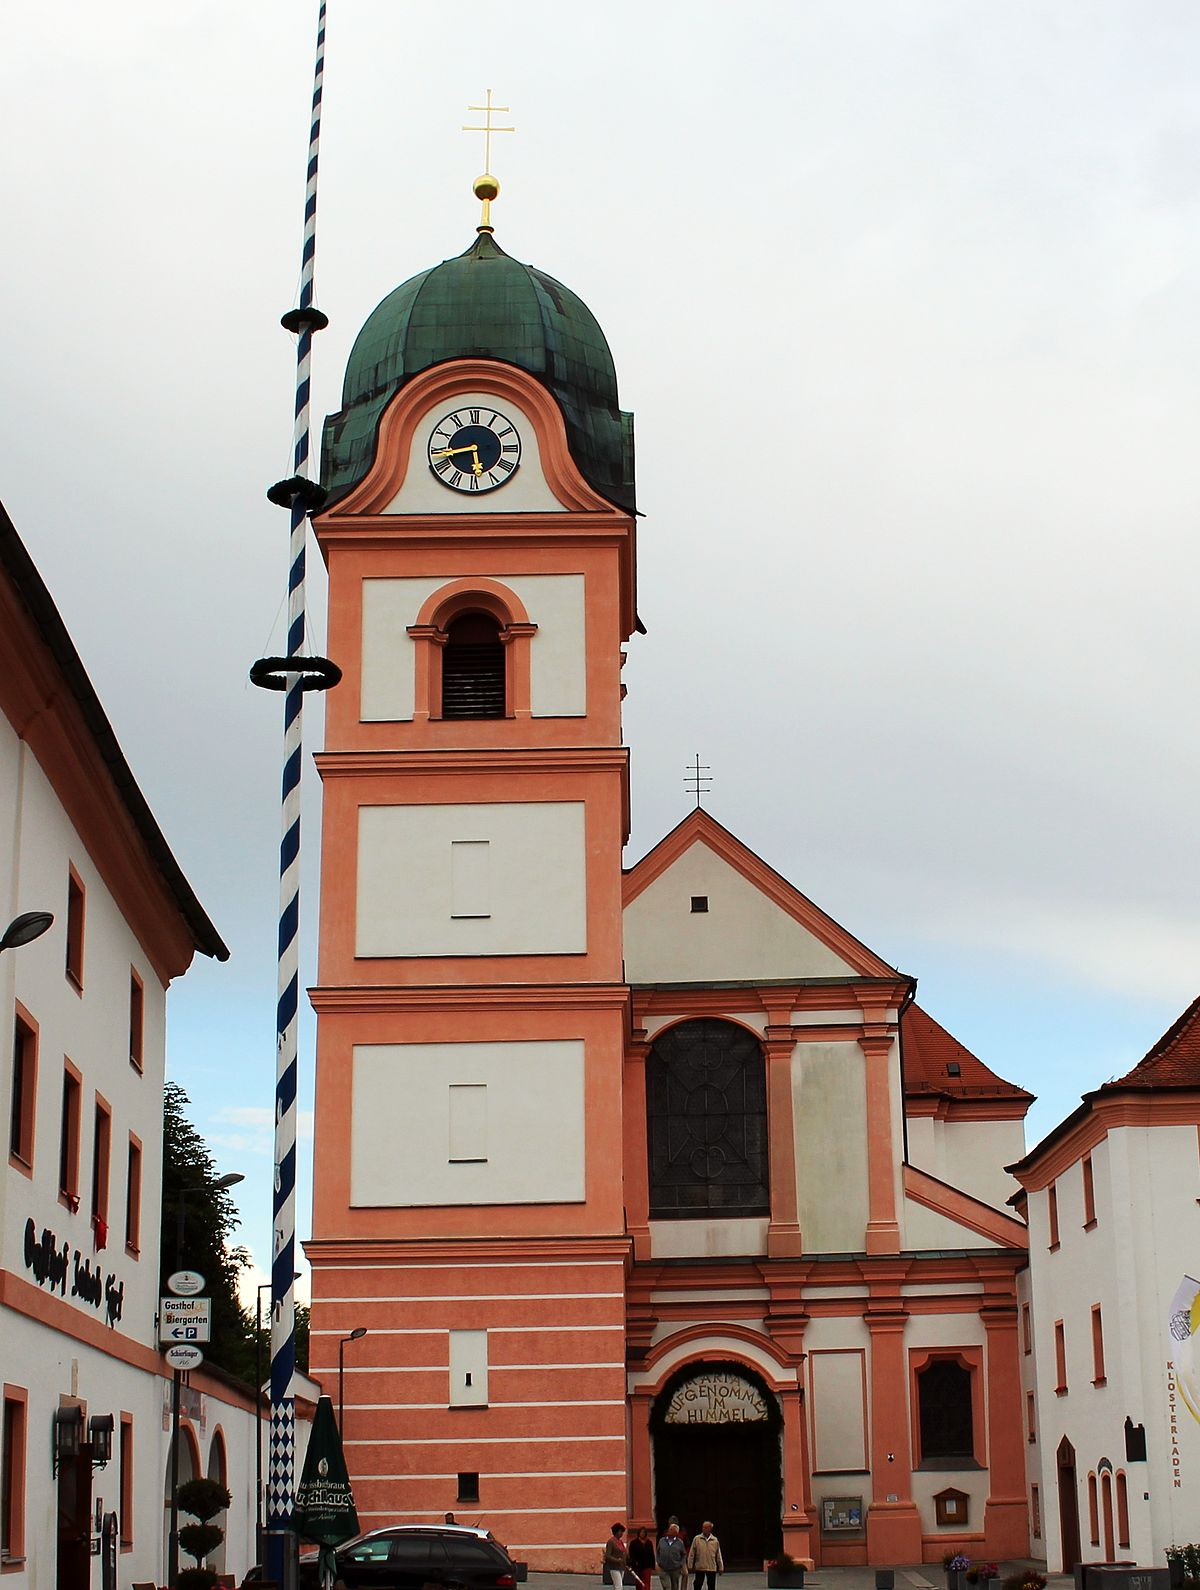 Rohr Niederbayern